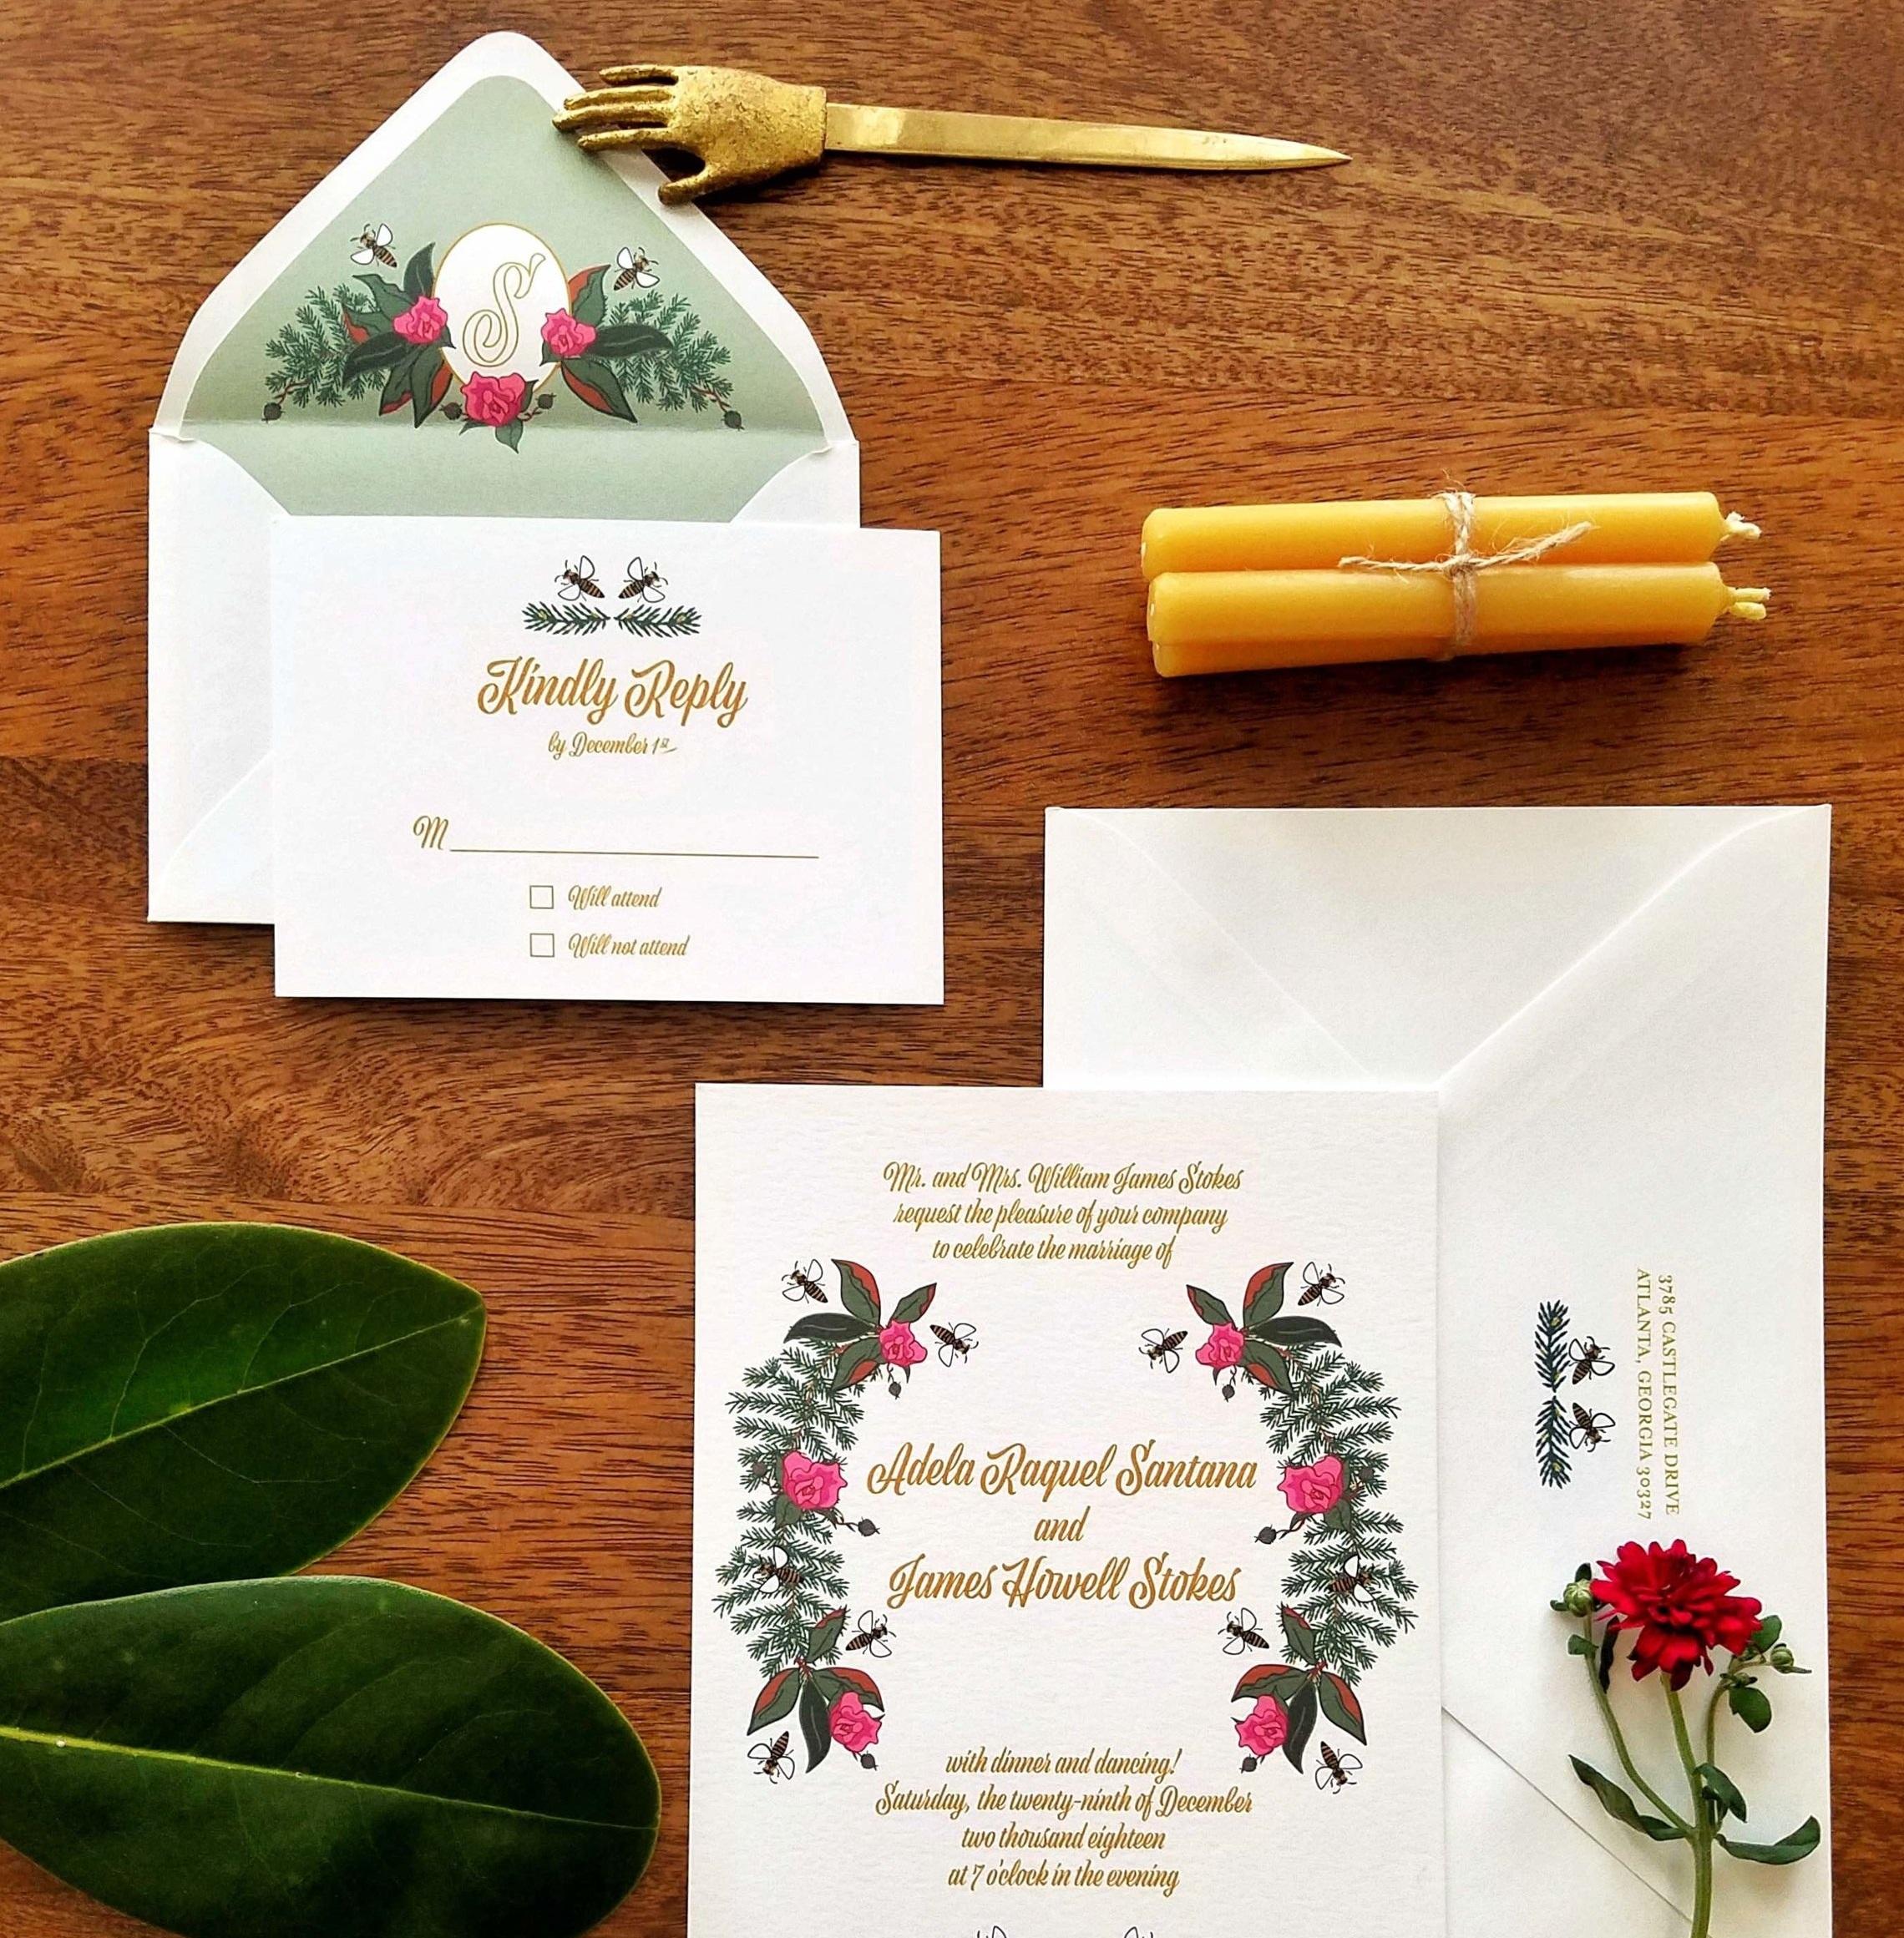 © Aesthete studio, custom wedding design